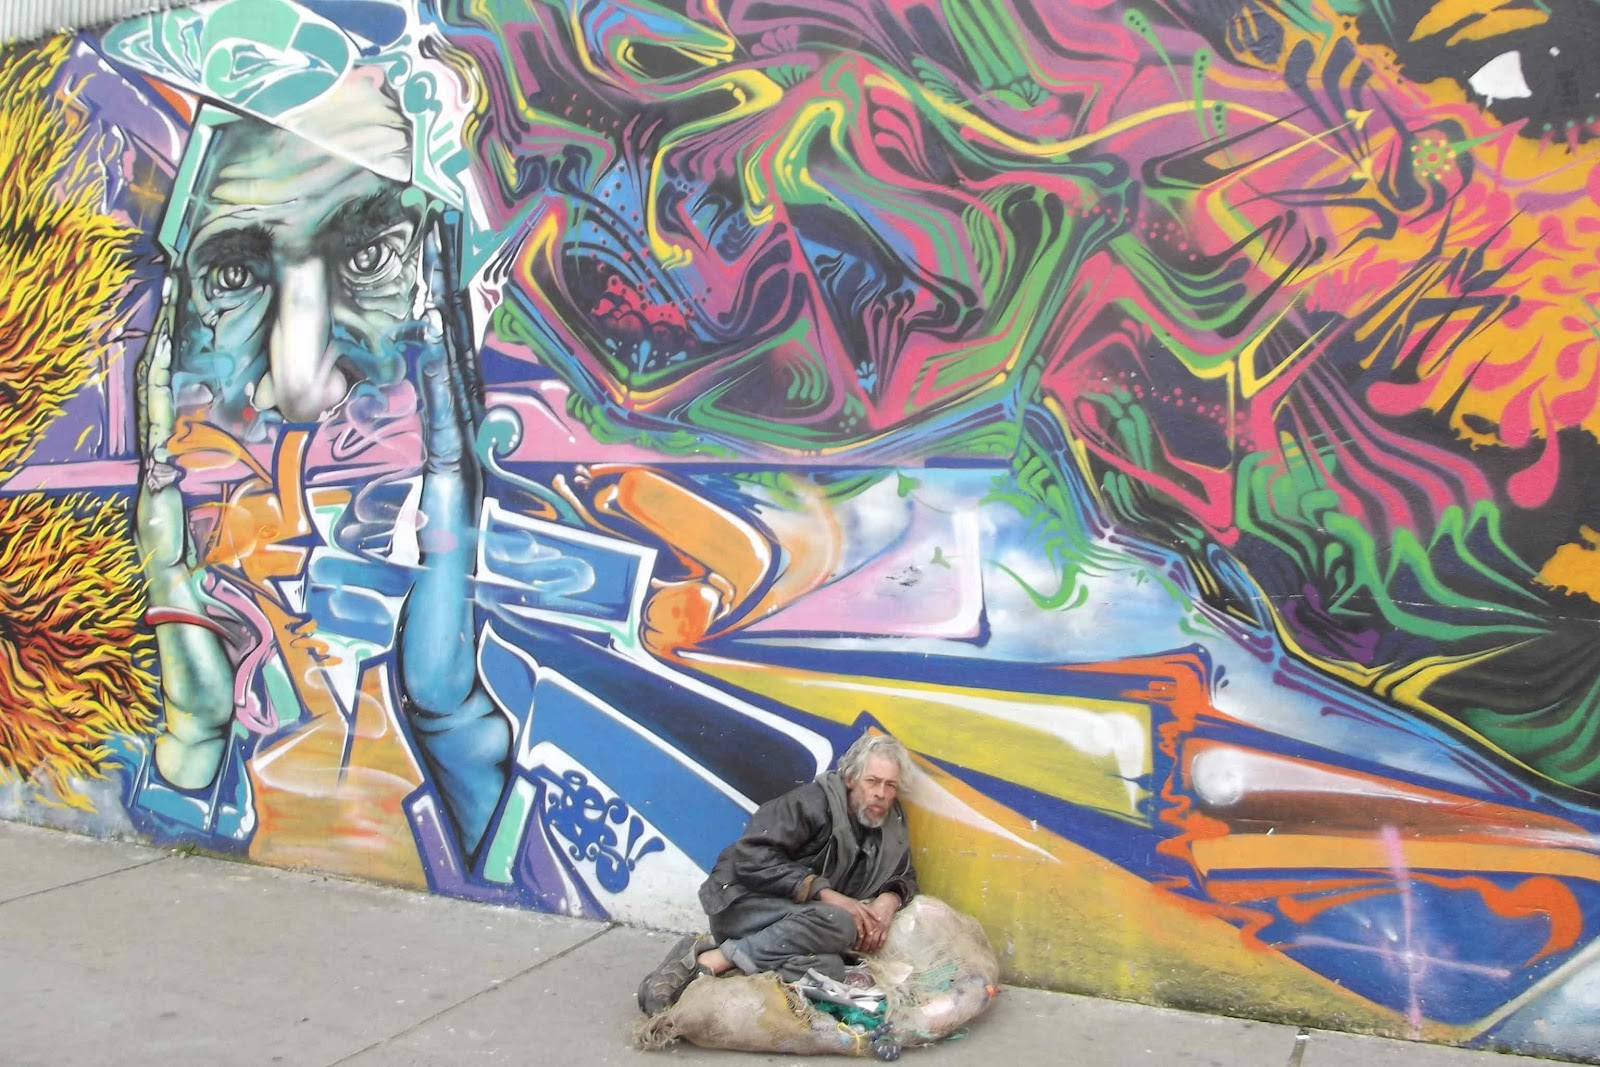 http://4.bp.blogspot.com/-vSA_eWqDjpw/T-VF7qtEdnI/AAAAAAAAIz4/KicrjVdACV8/s1600/mural+and+homeless.JPG